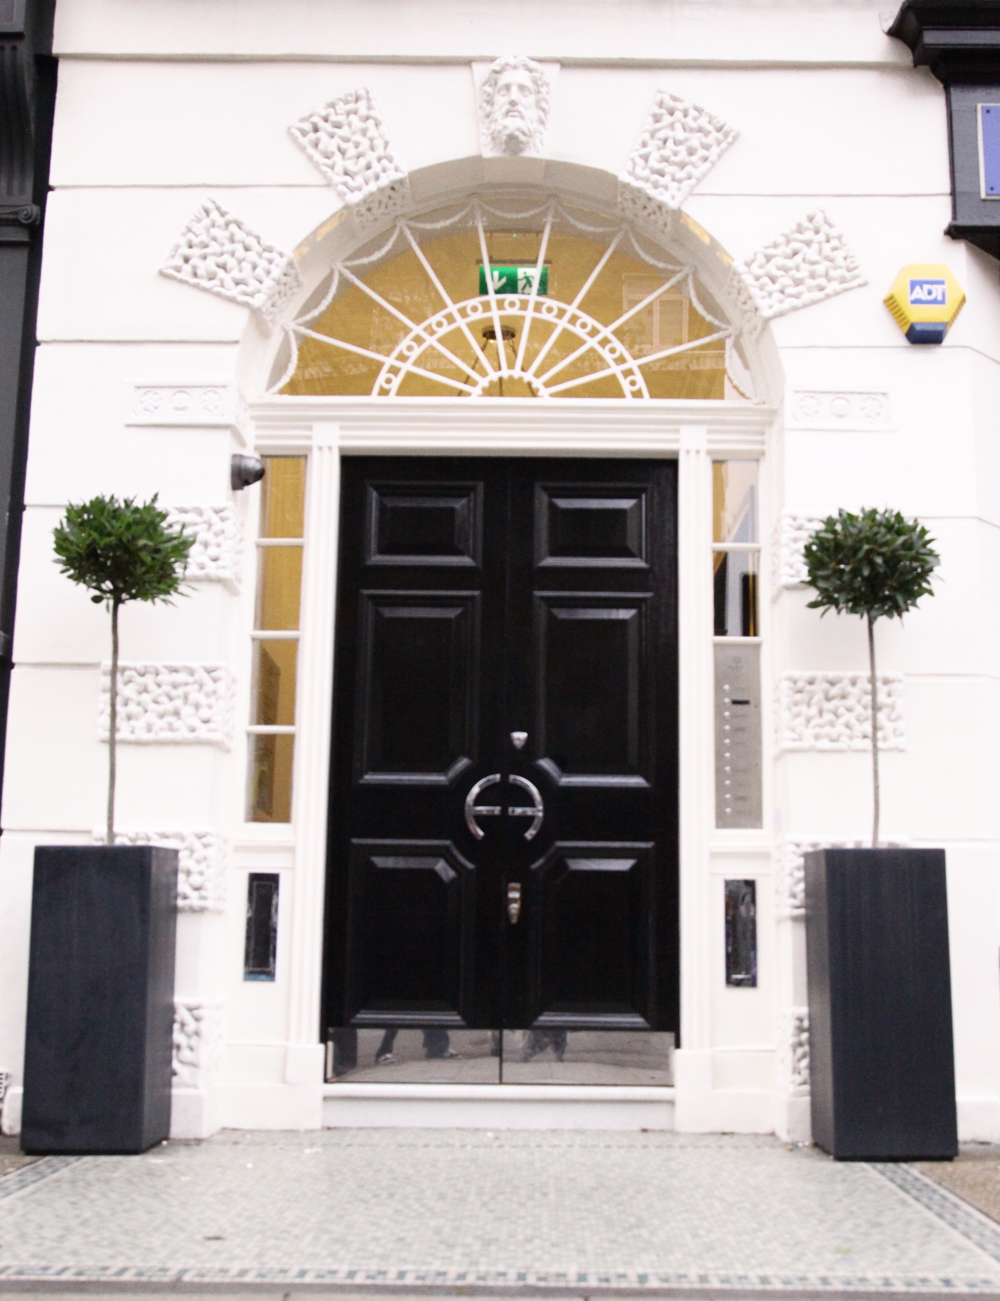 Villagery - Baker Street Business Centre - 115 Baker Street, W1 - Baker Street